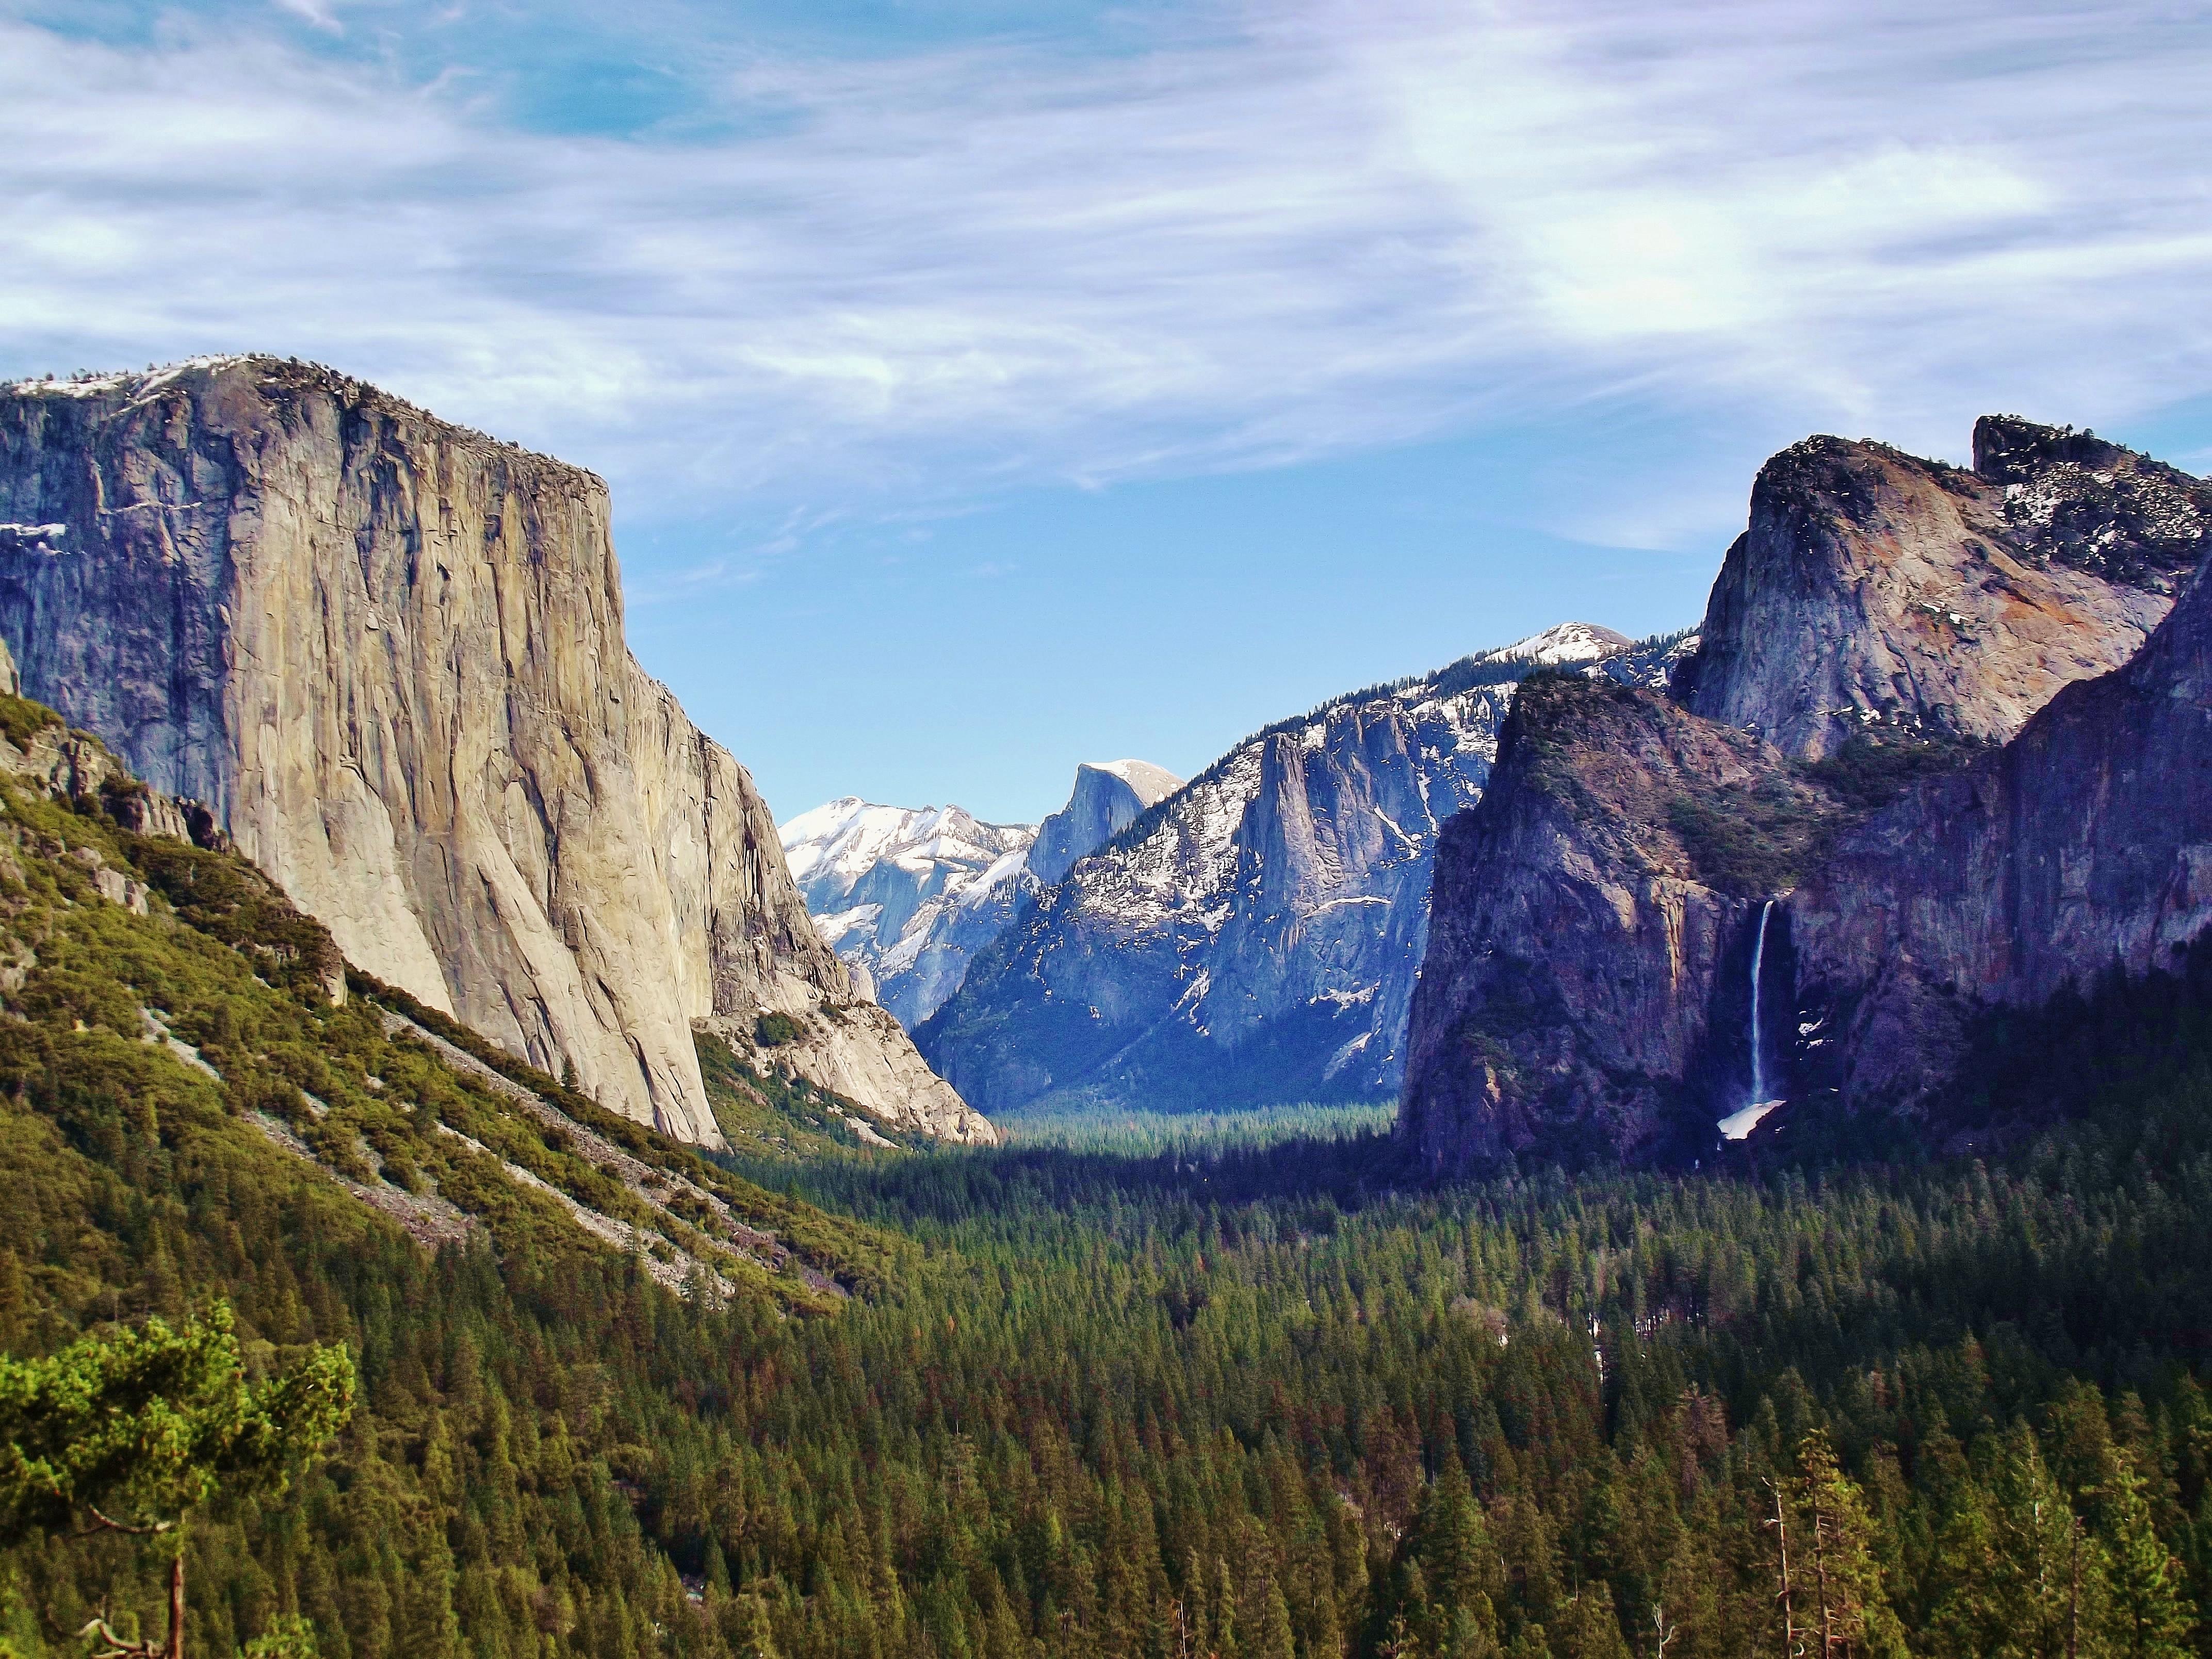 Yosemite_Valley_from_Wawona_Tunnel_view,